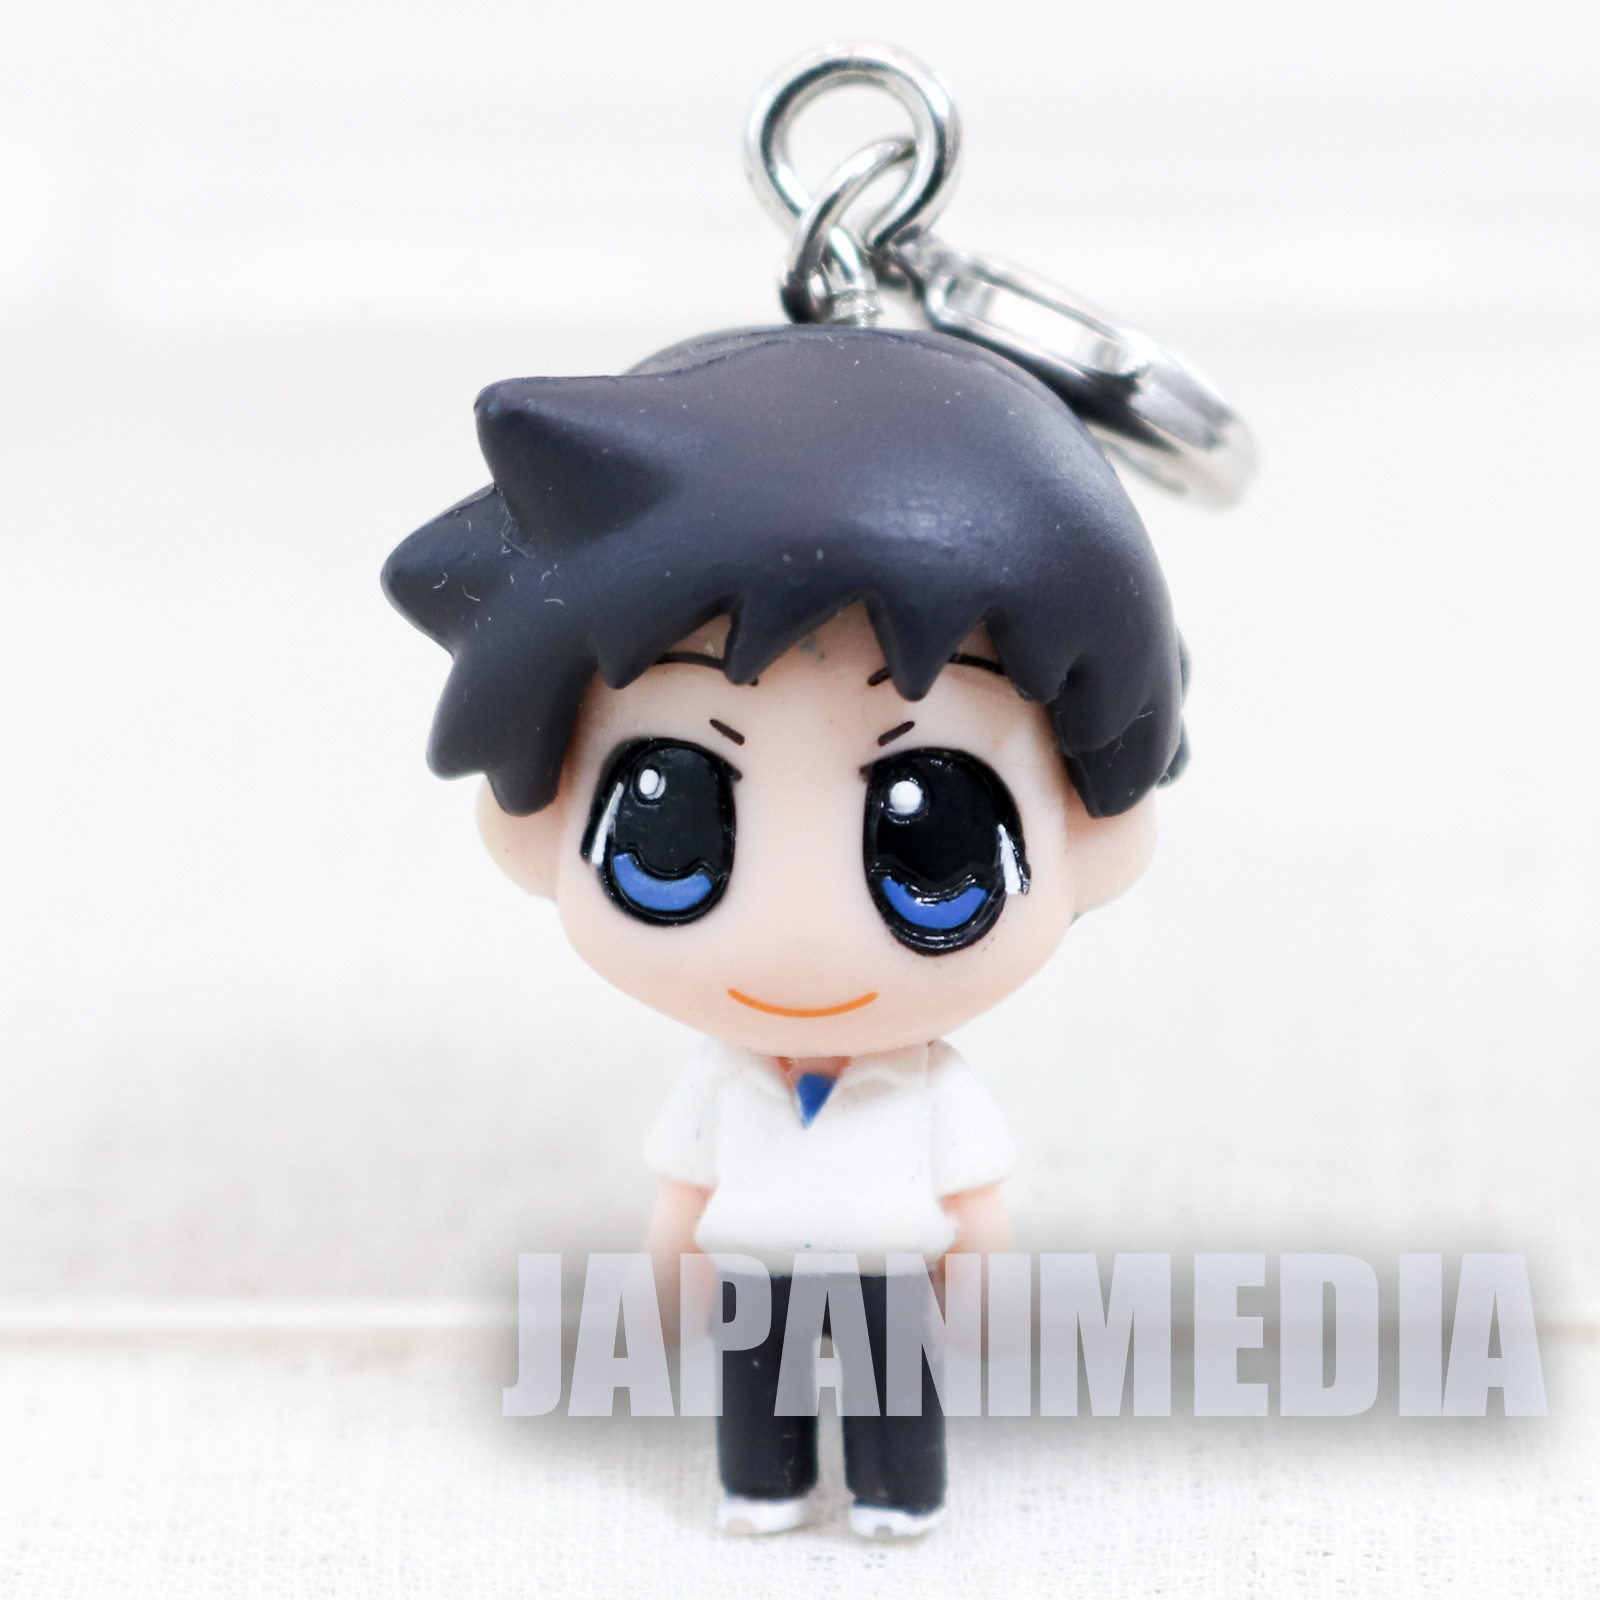 Evangelion Shinji Ikari School Uniform Petit EVA Chara Fortune Mini Figure Charm